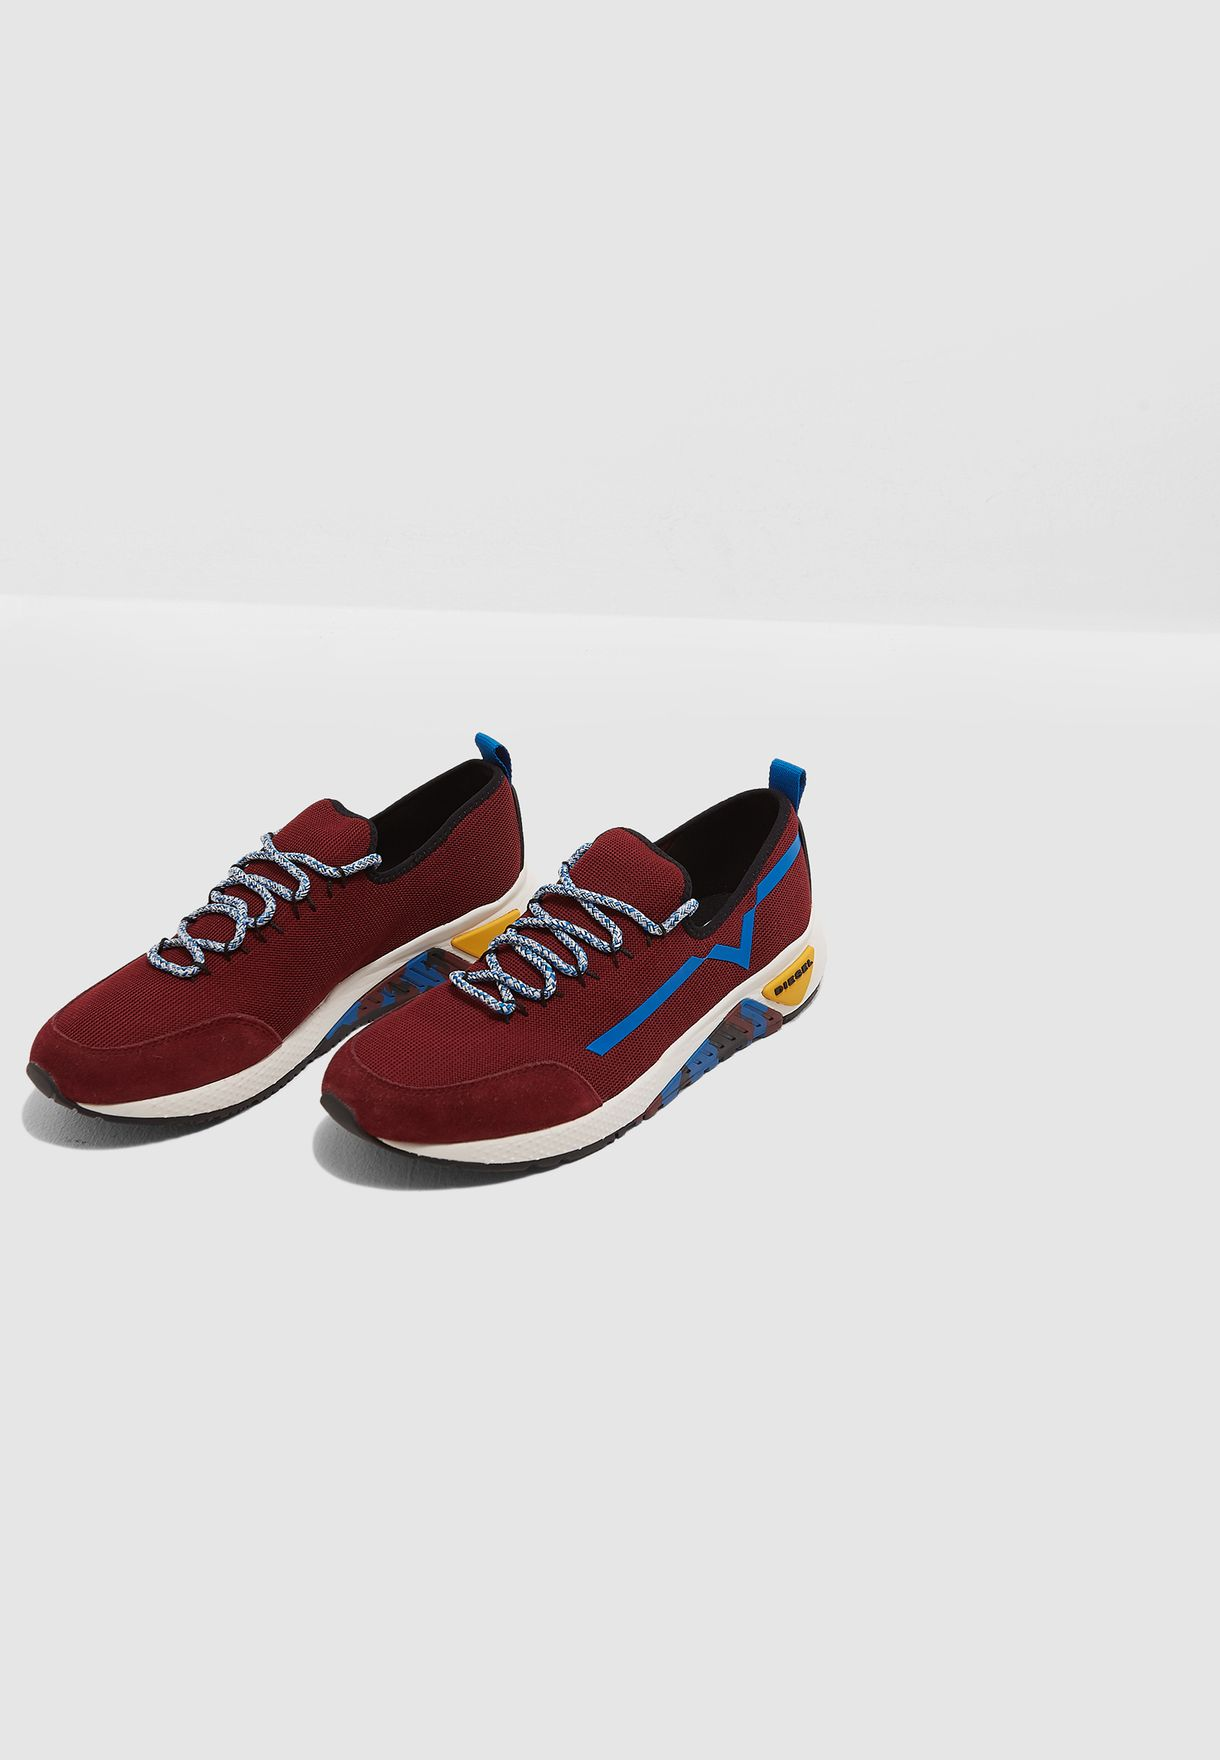 S-Kbay Sneakers